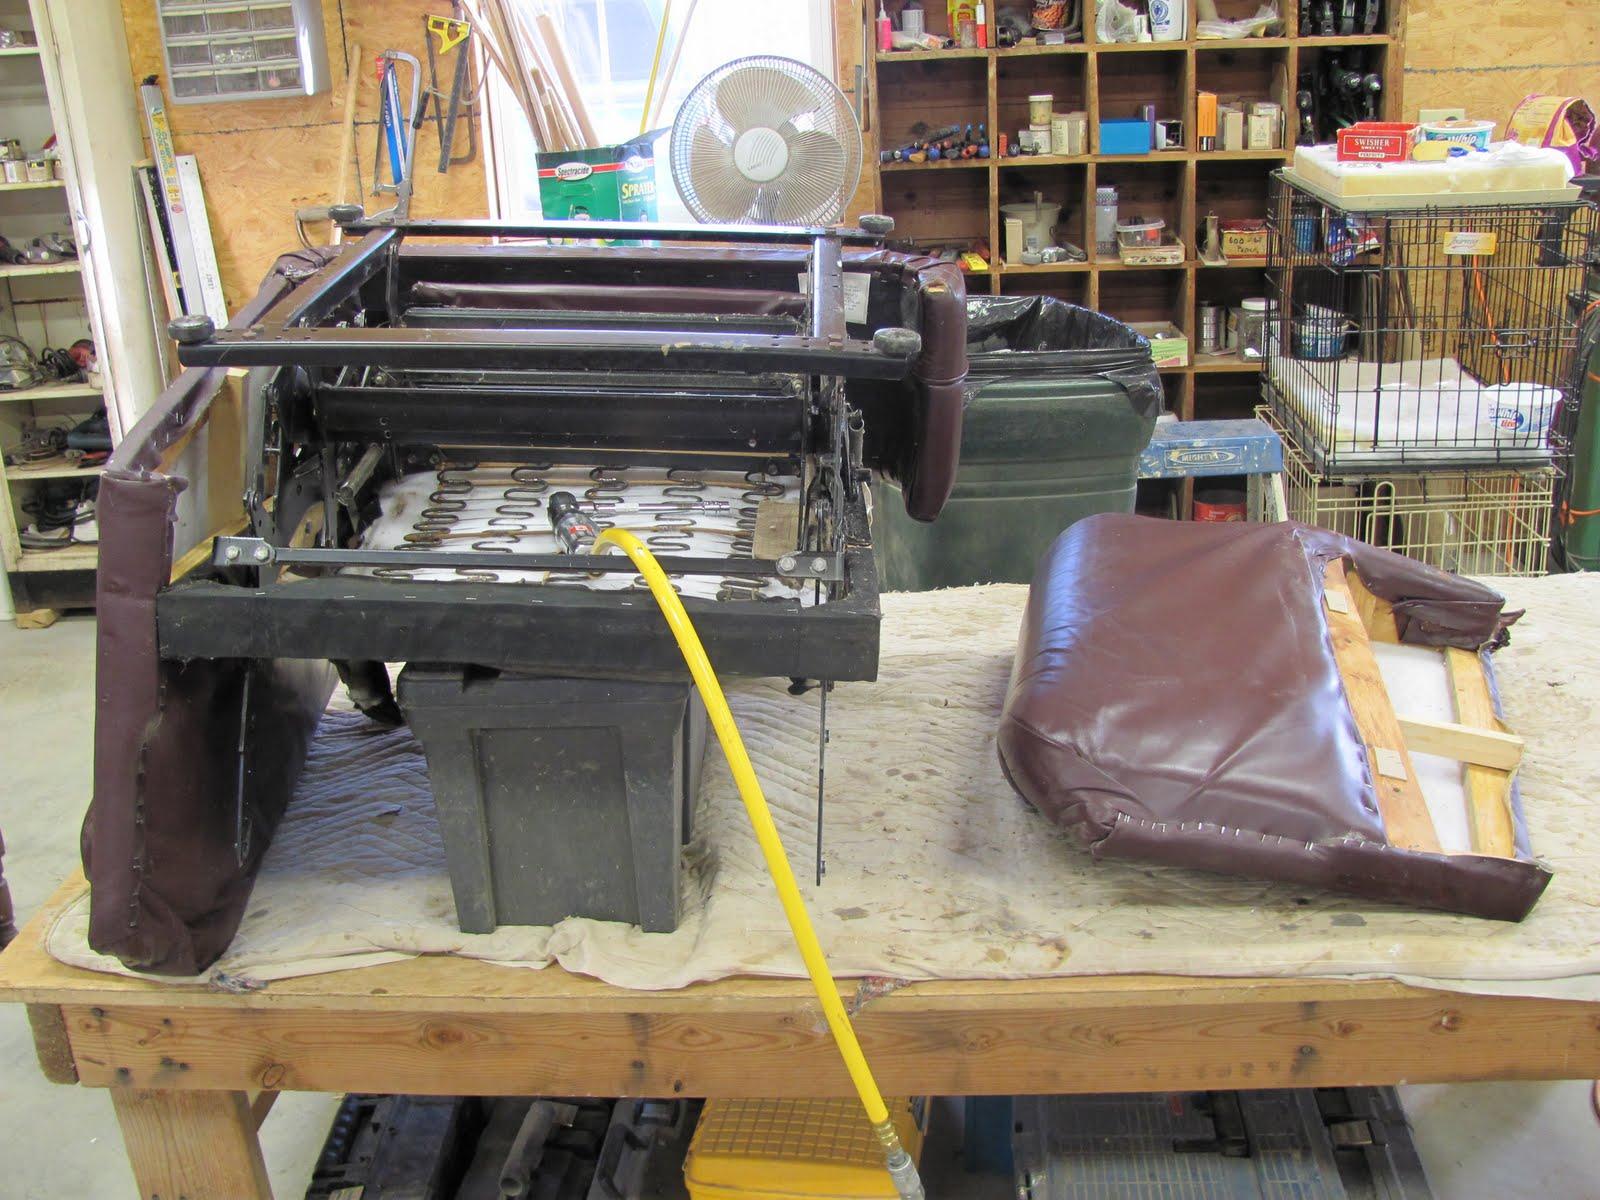 Recliner Chair Handle Broken Staples Mats For Carpet Canada Thomas Nelson Furniture Restoration Arm